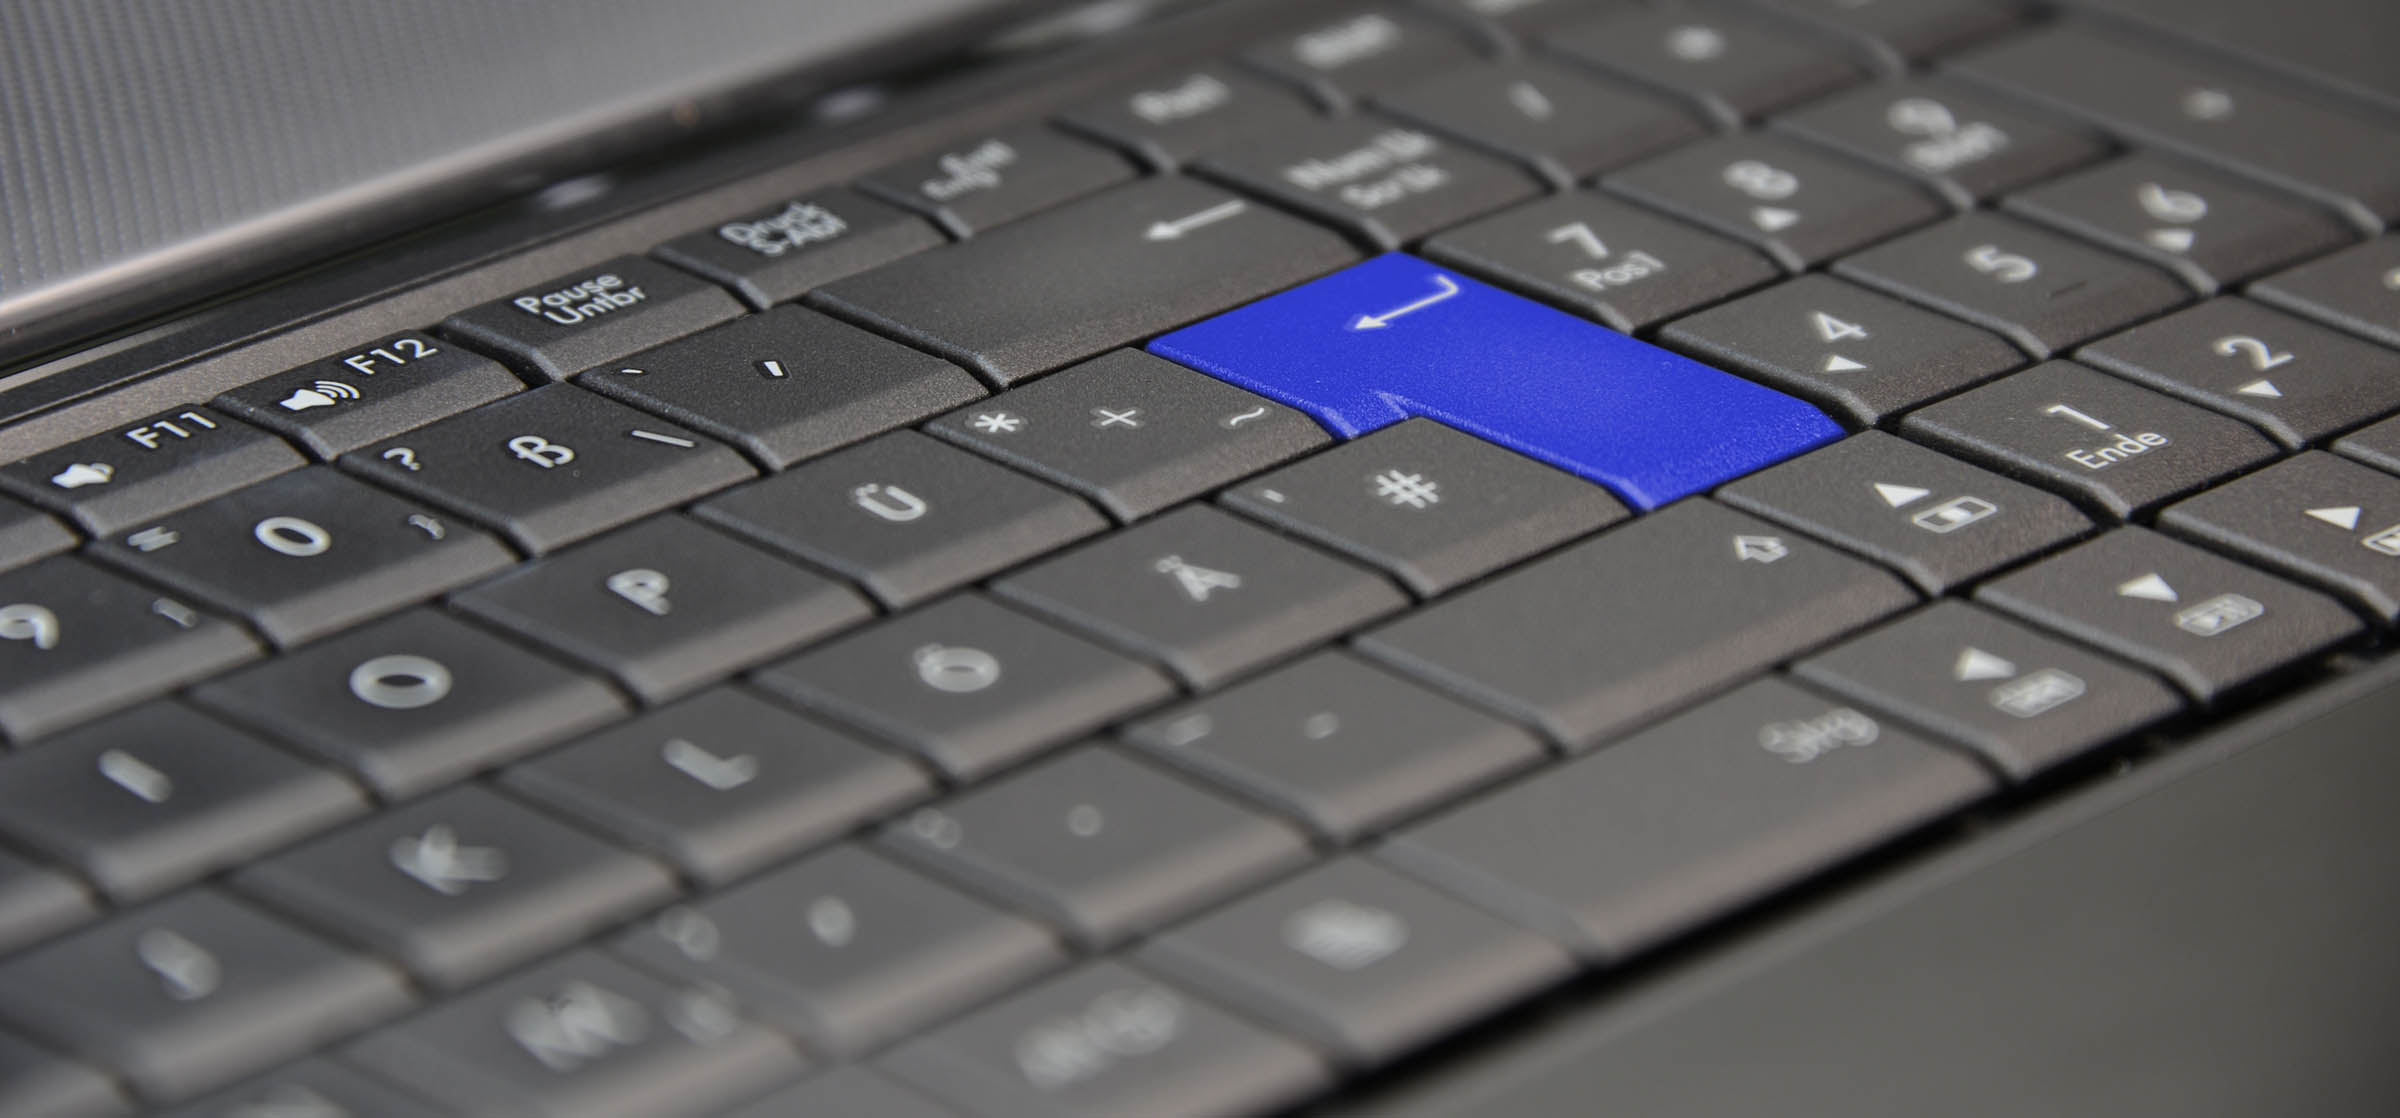 Blaue Taste Auf Tastatur Individuelles Inkasso Germania Inkasso